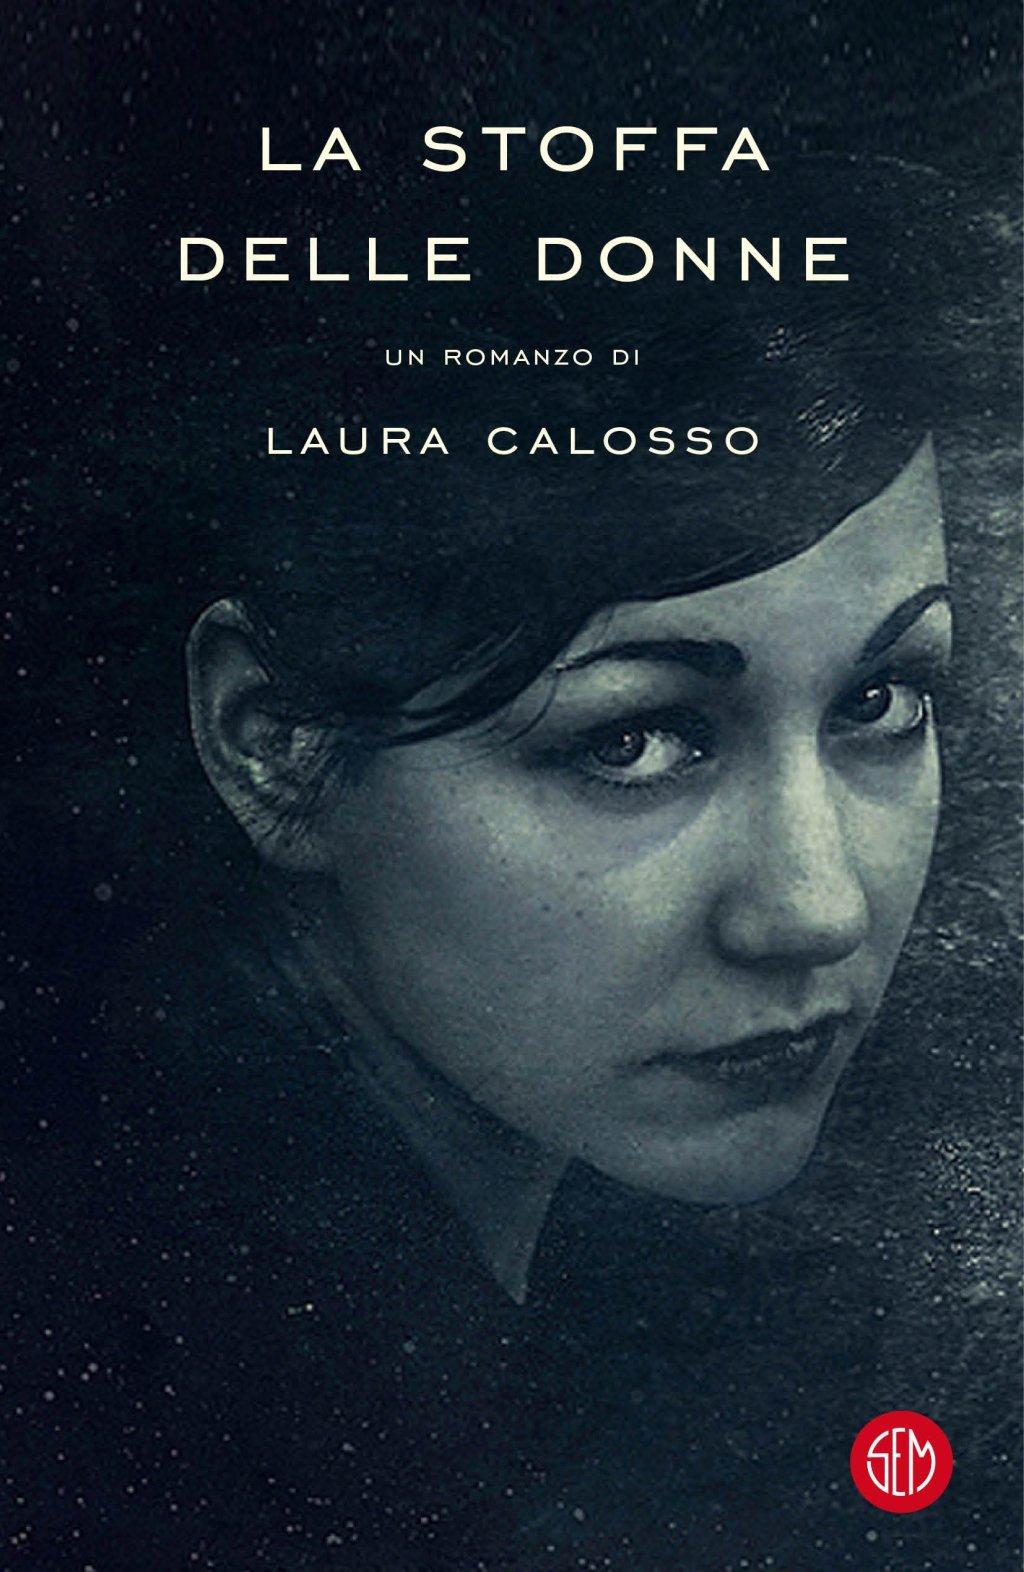 Laura Calosso